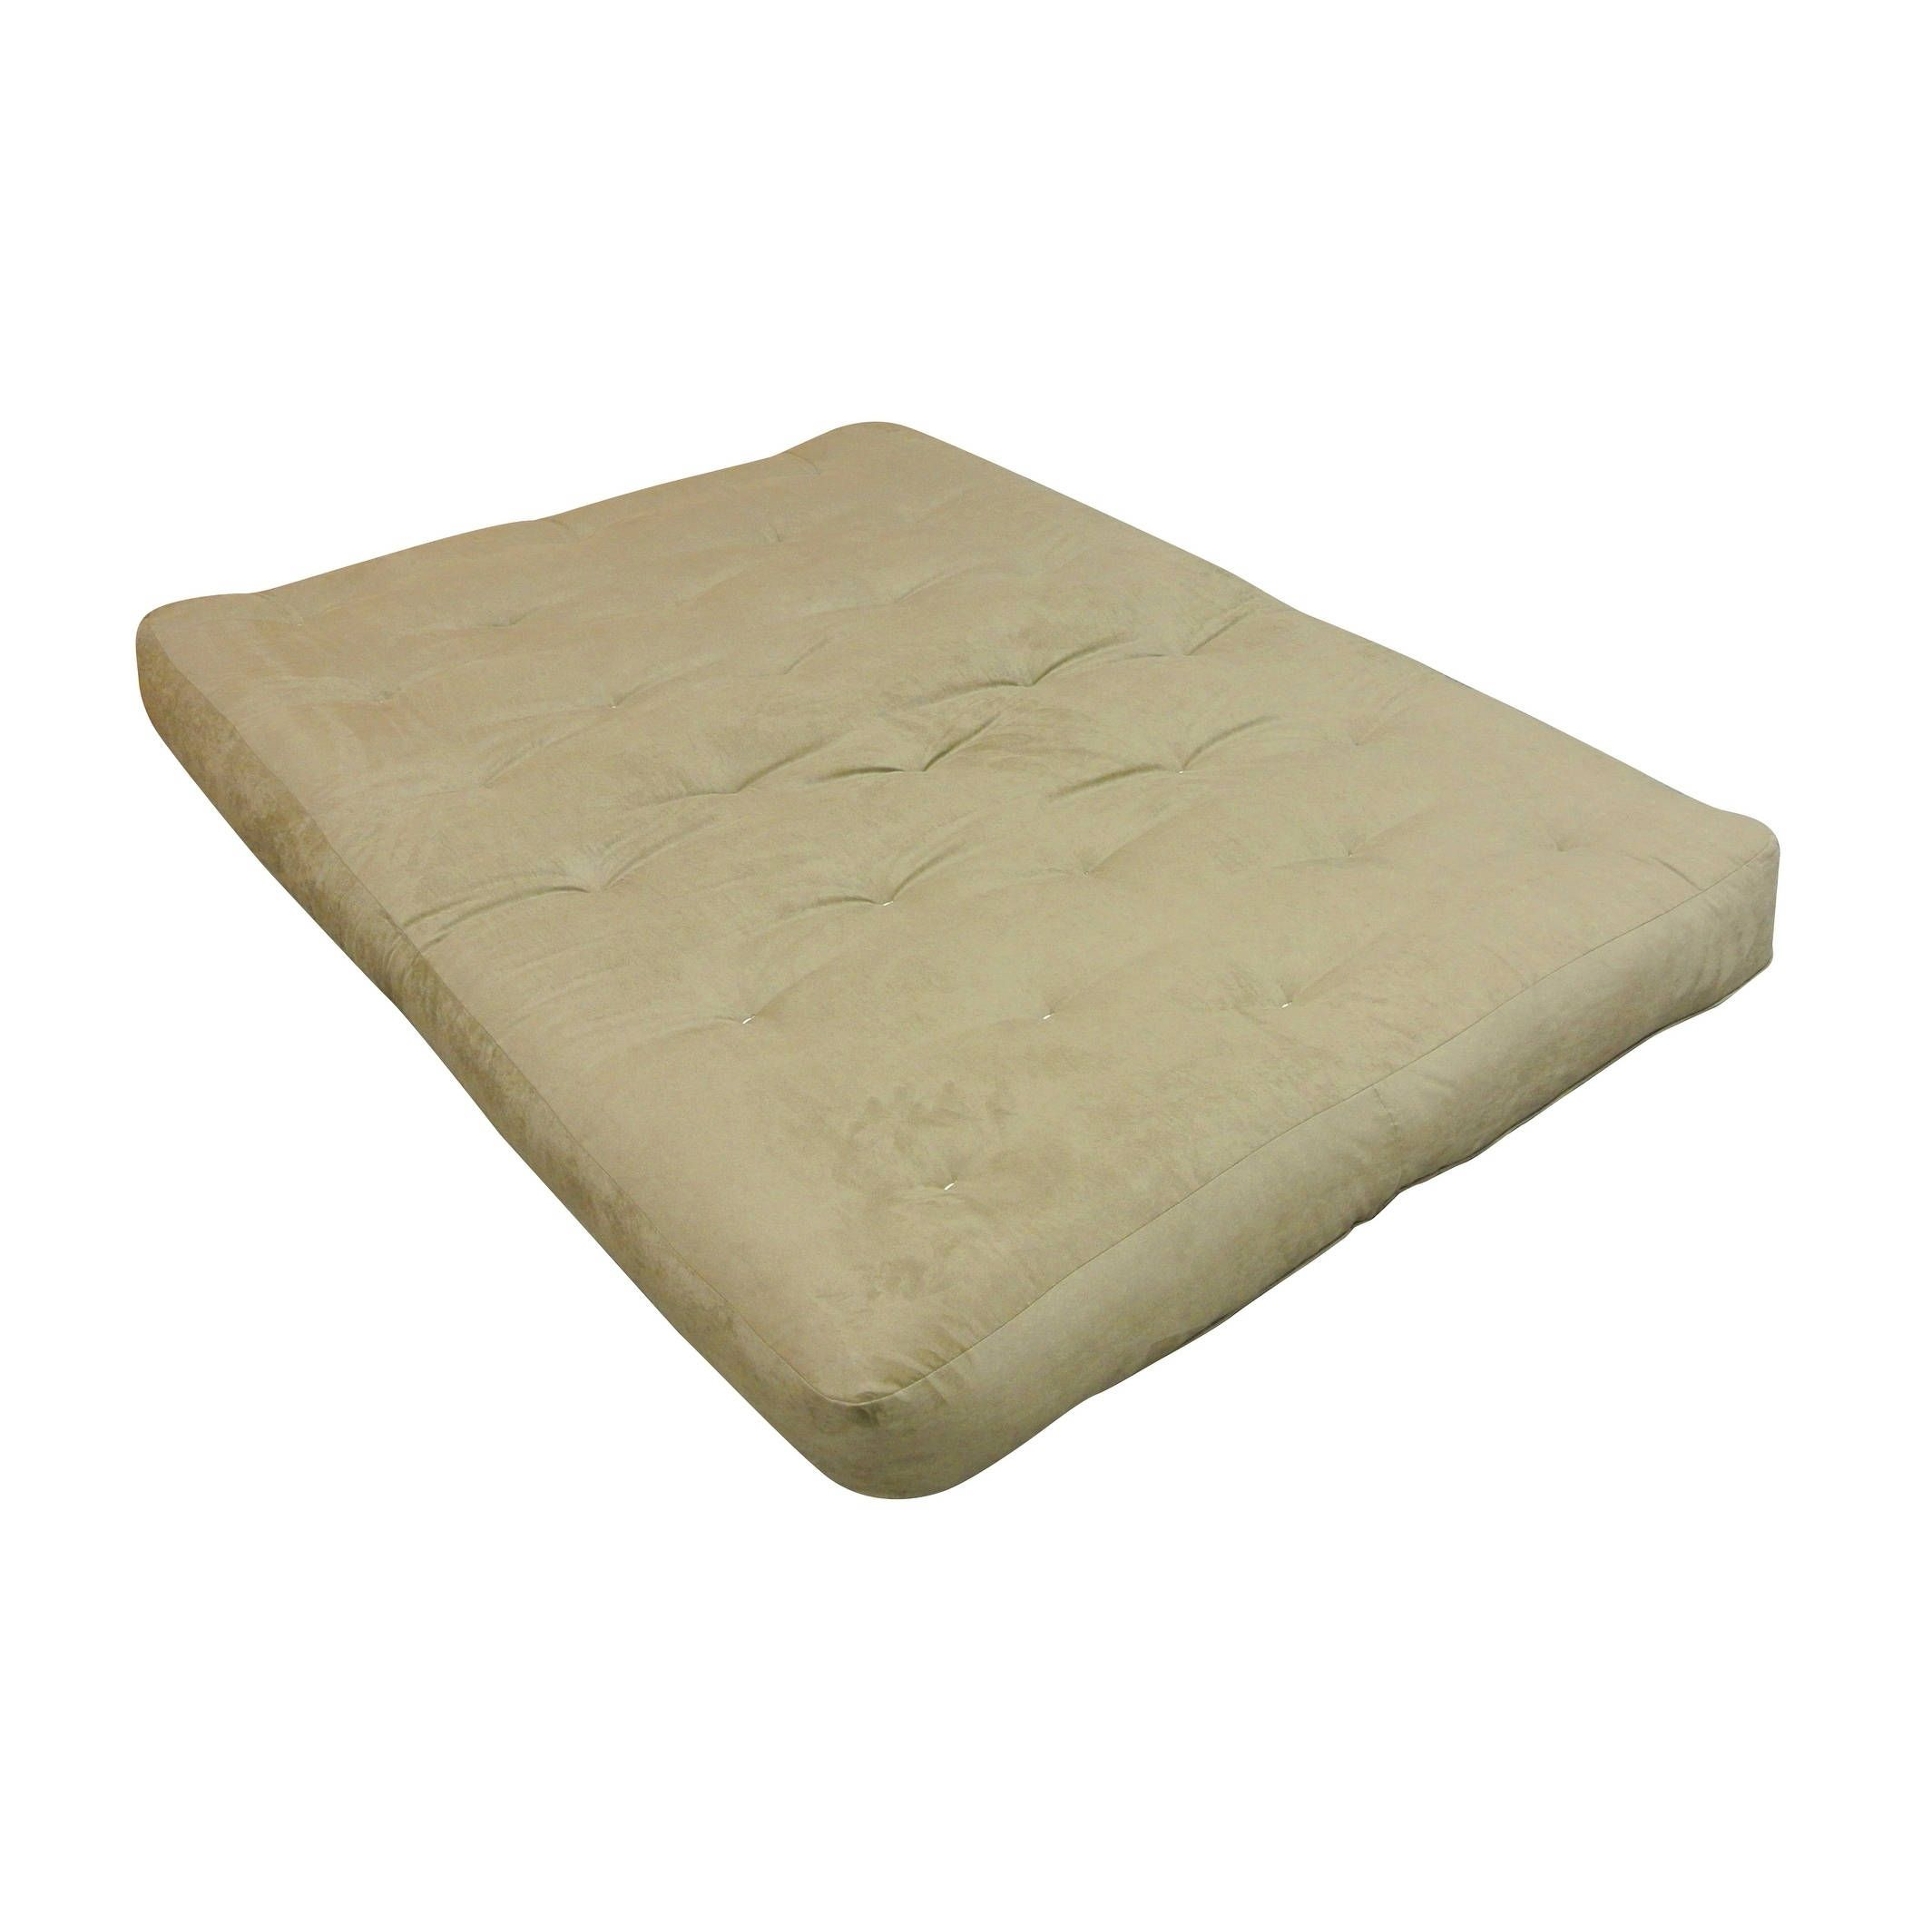 6 Single Foam Cotton 21x39 Twin Loveseat Ottoman Chocolate Microfiber Futon Mattress Brown